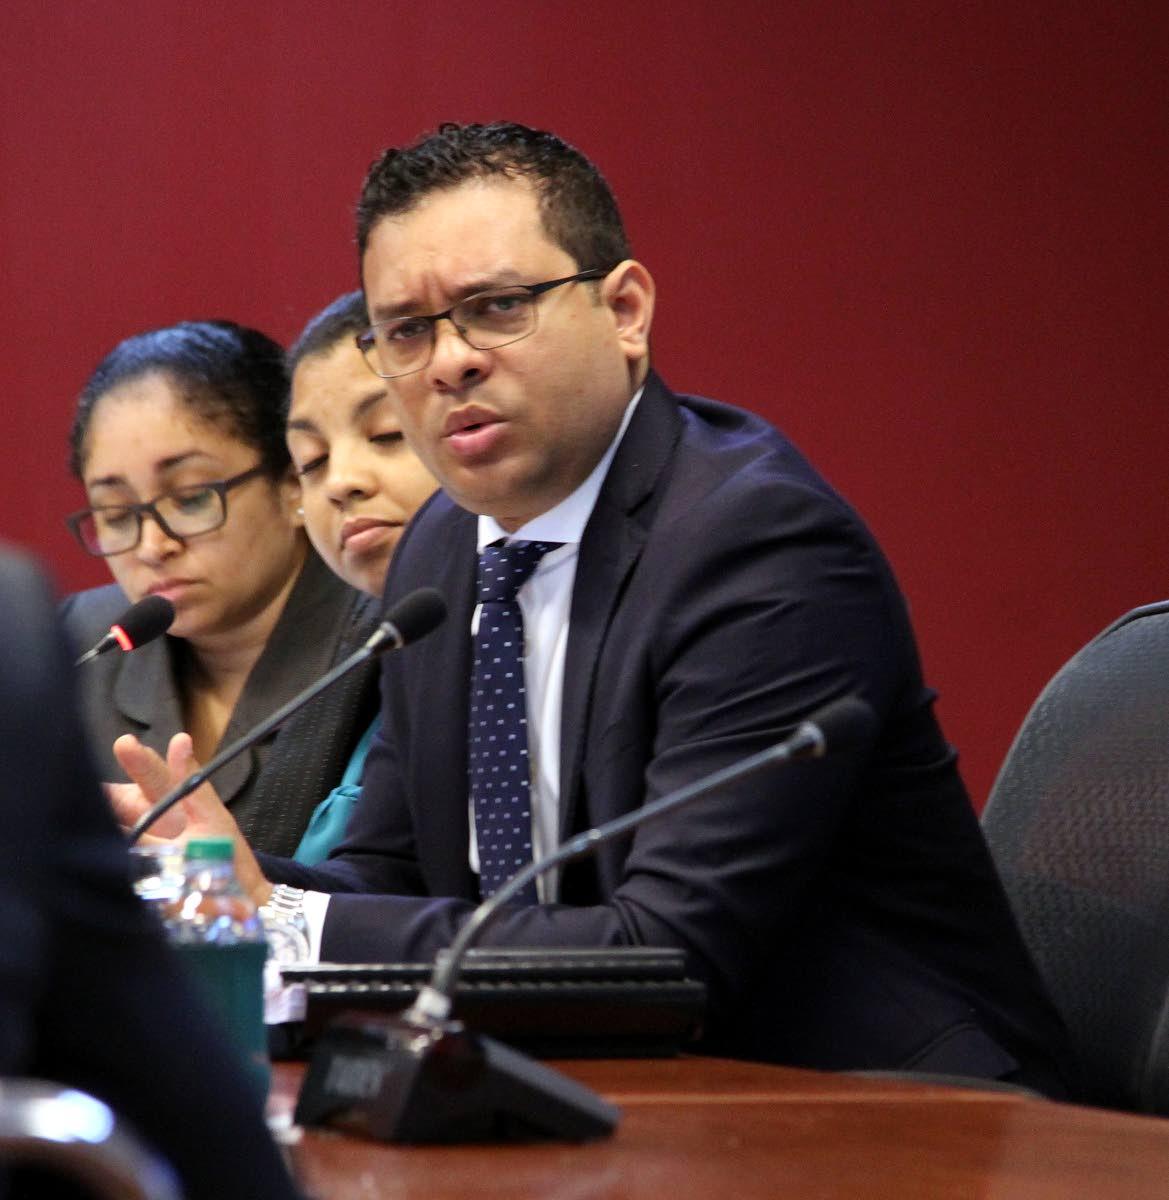 Tourism Minister Randall Mitchel